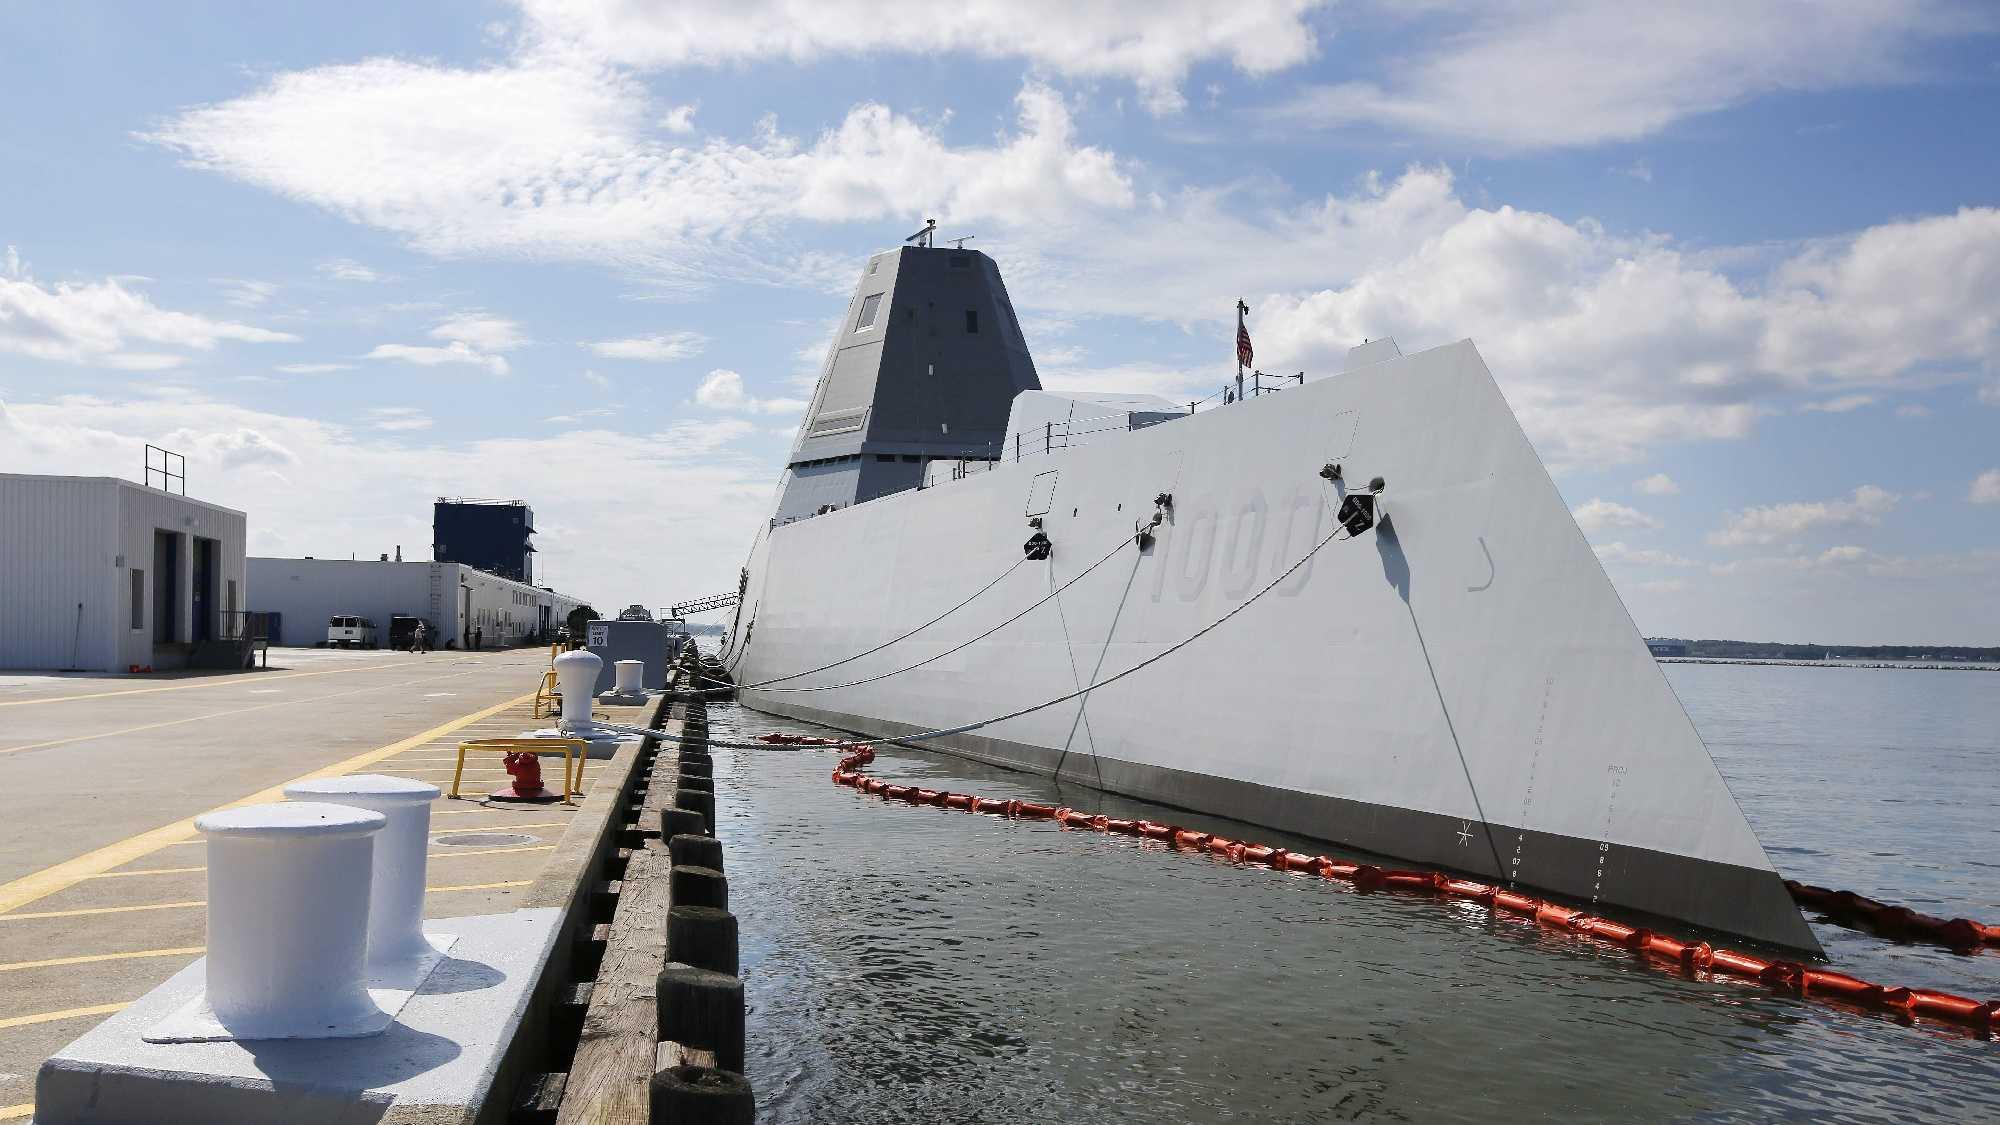 Zumwalt ship navy